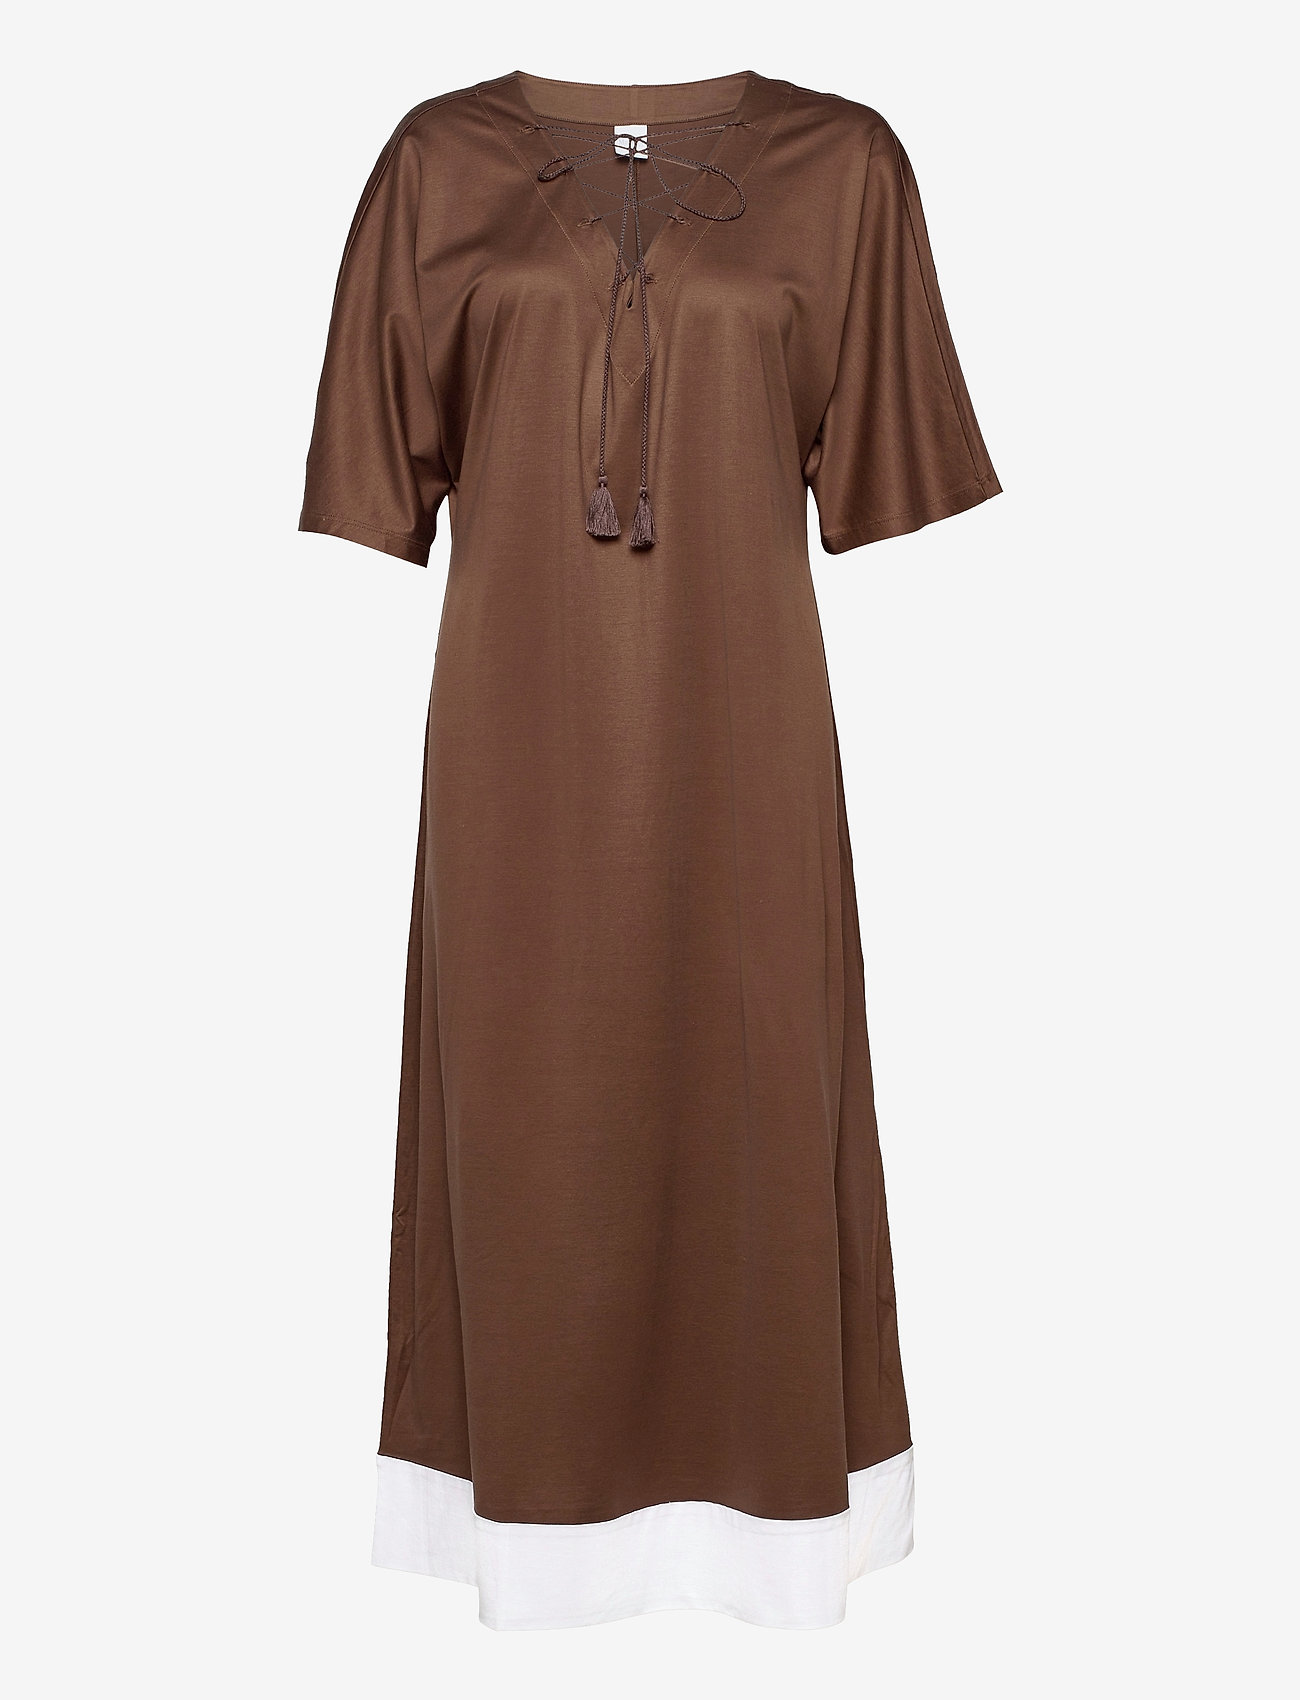 Max Mara Leisure - PROSIT - beachwear - brown - 0